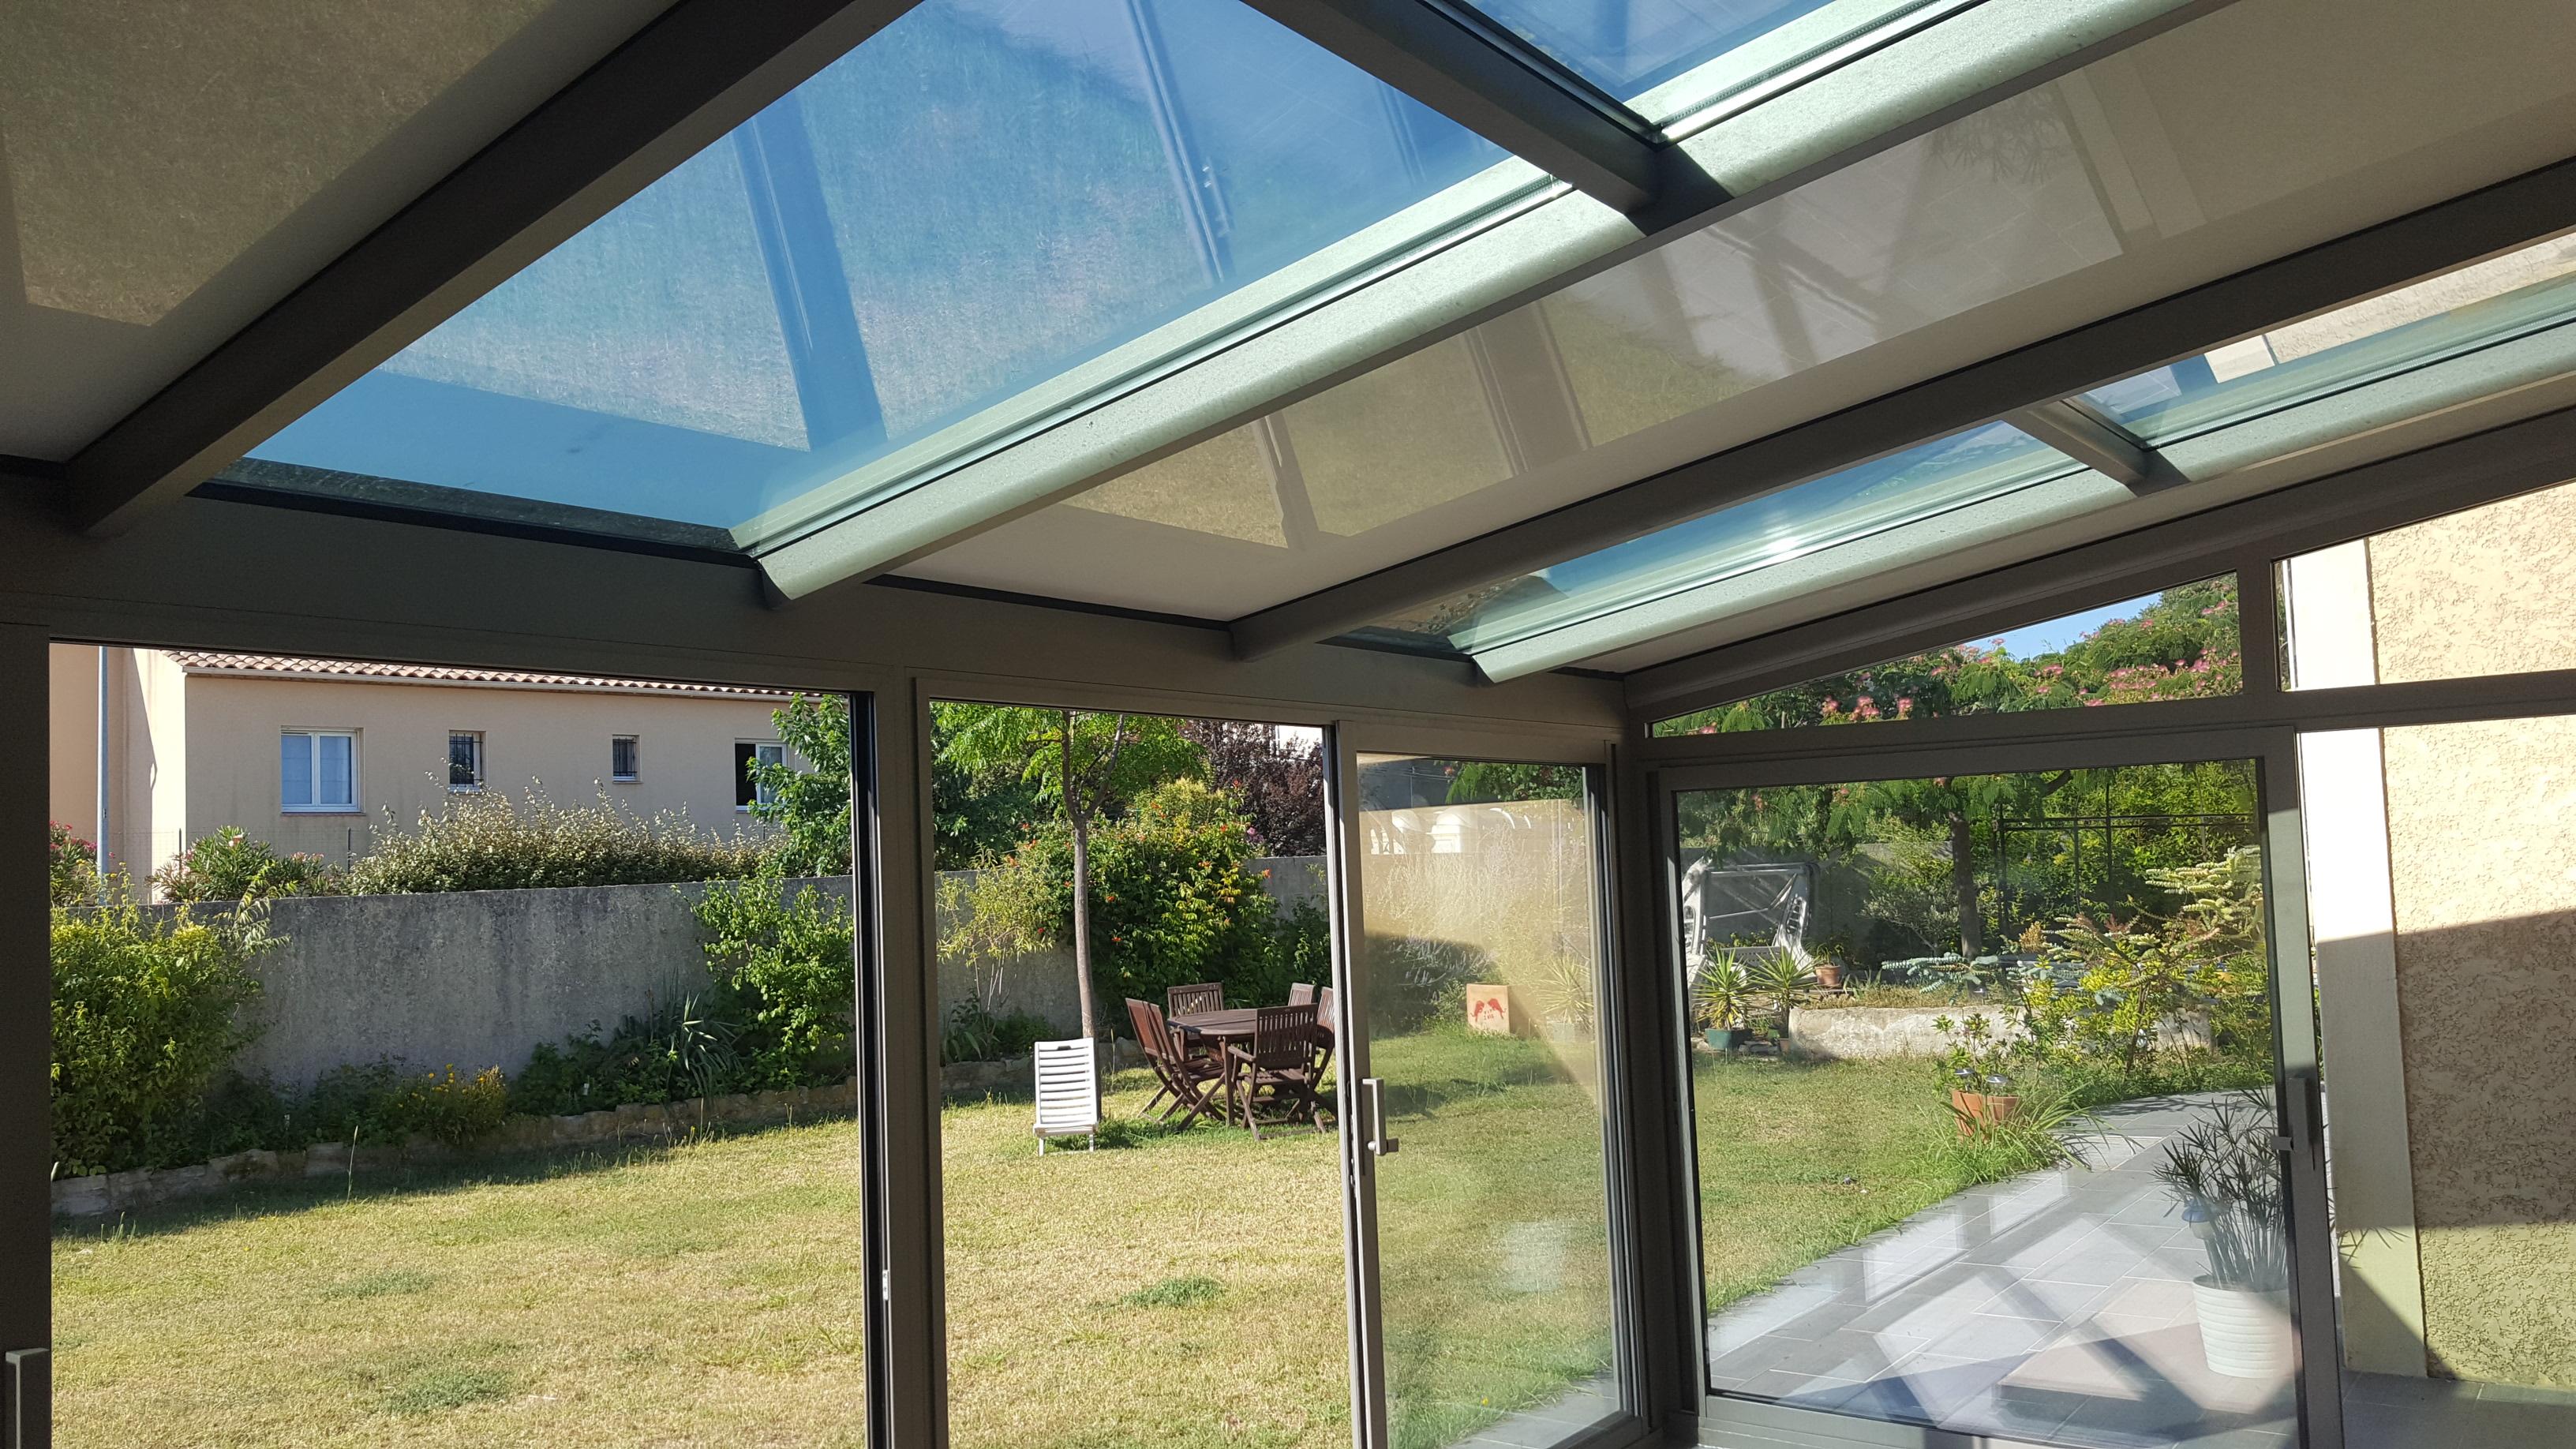 Véranda aluminium Technal à toiture mixte - Vente Véranda Technal